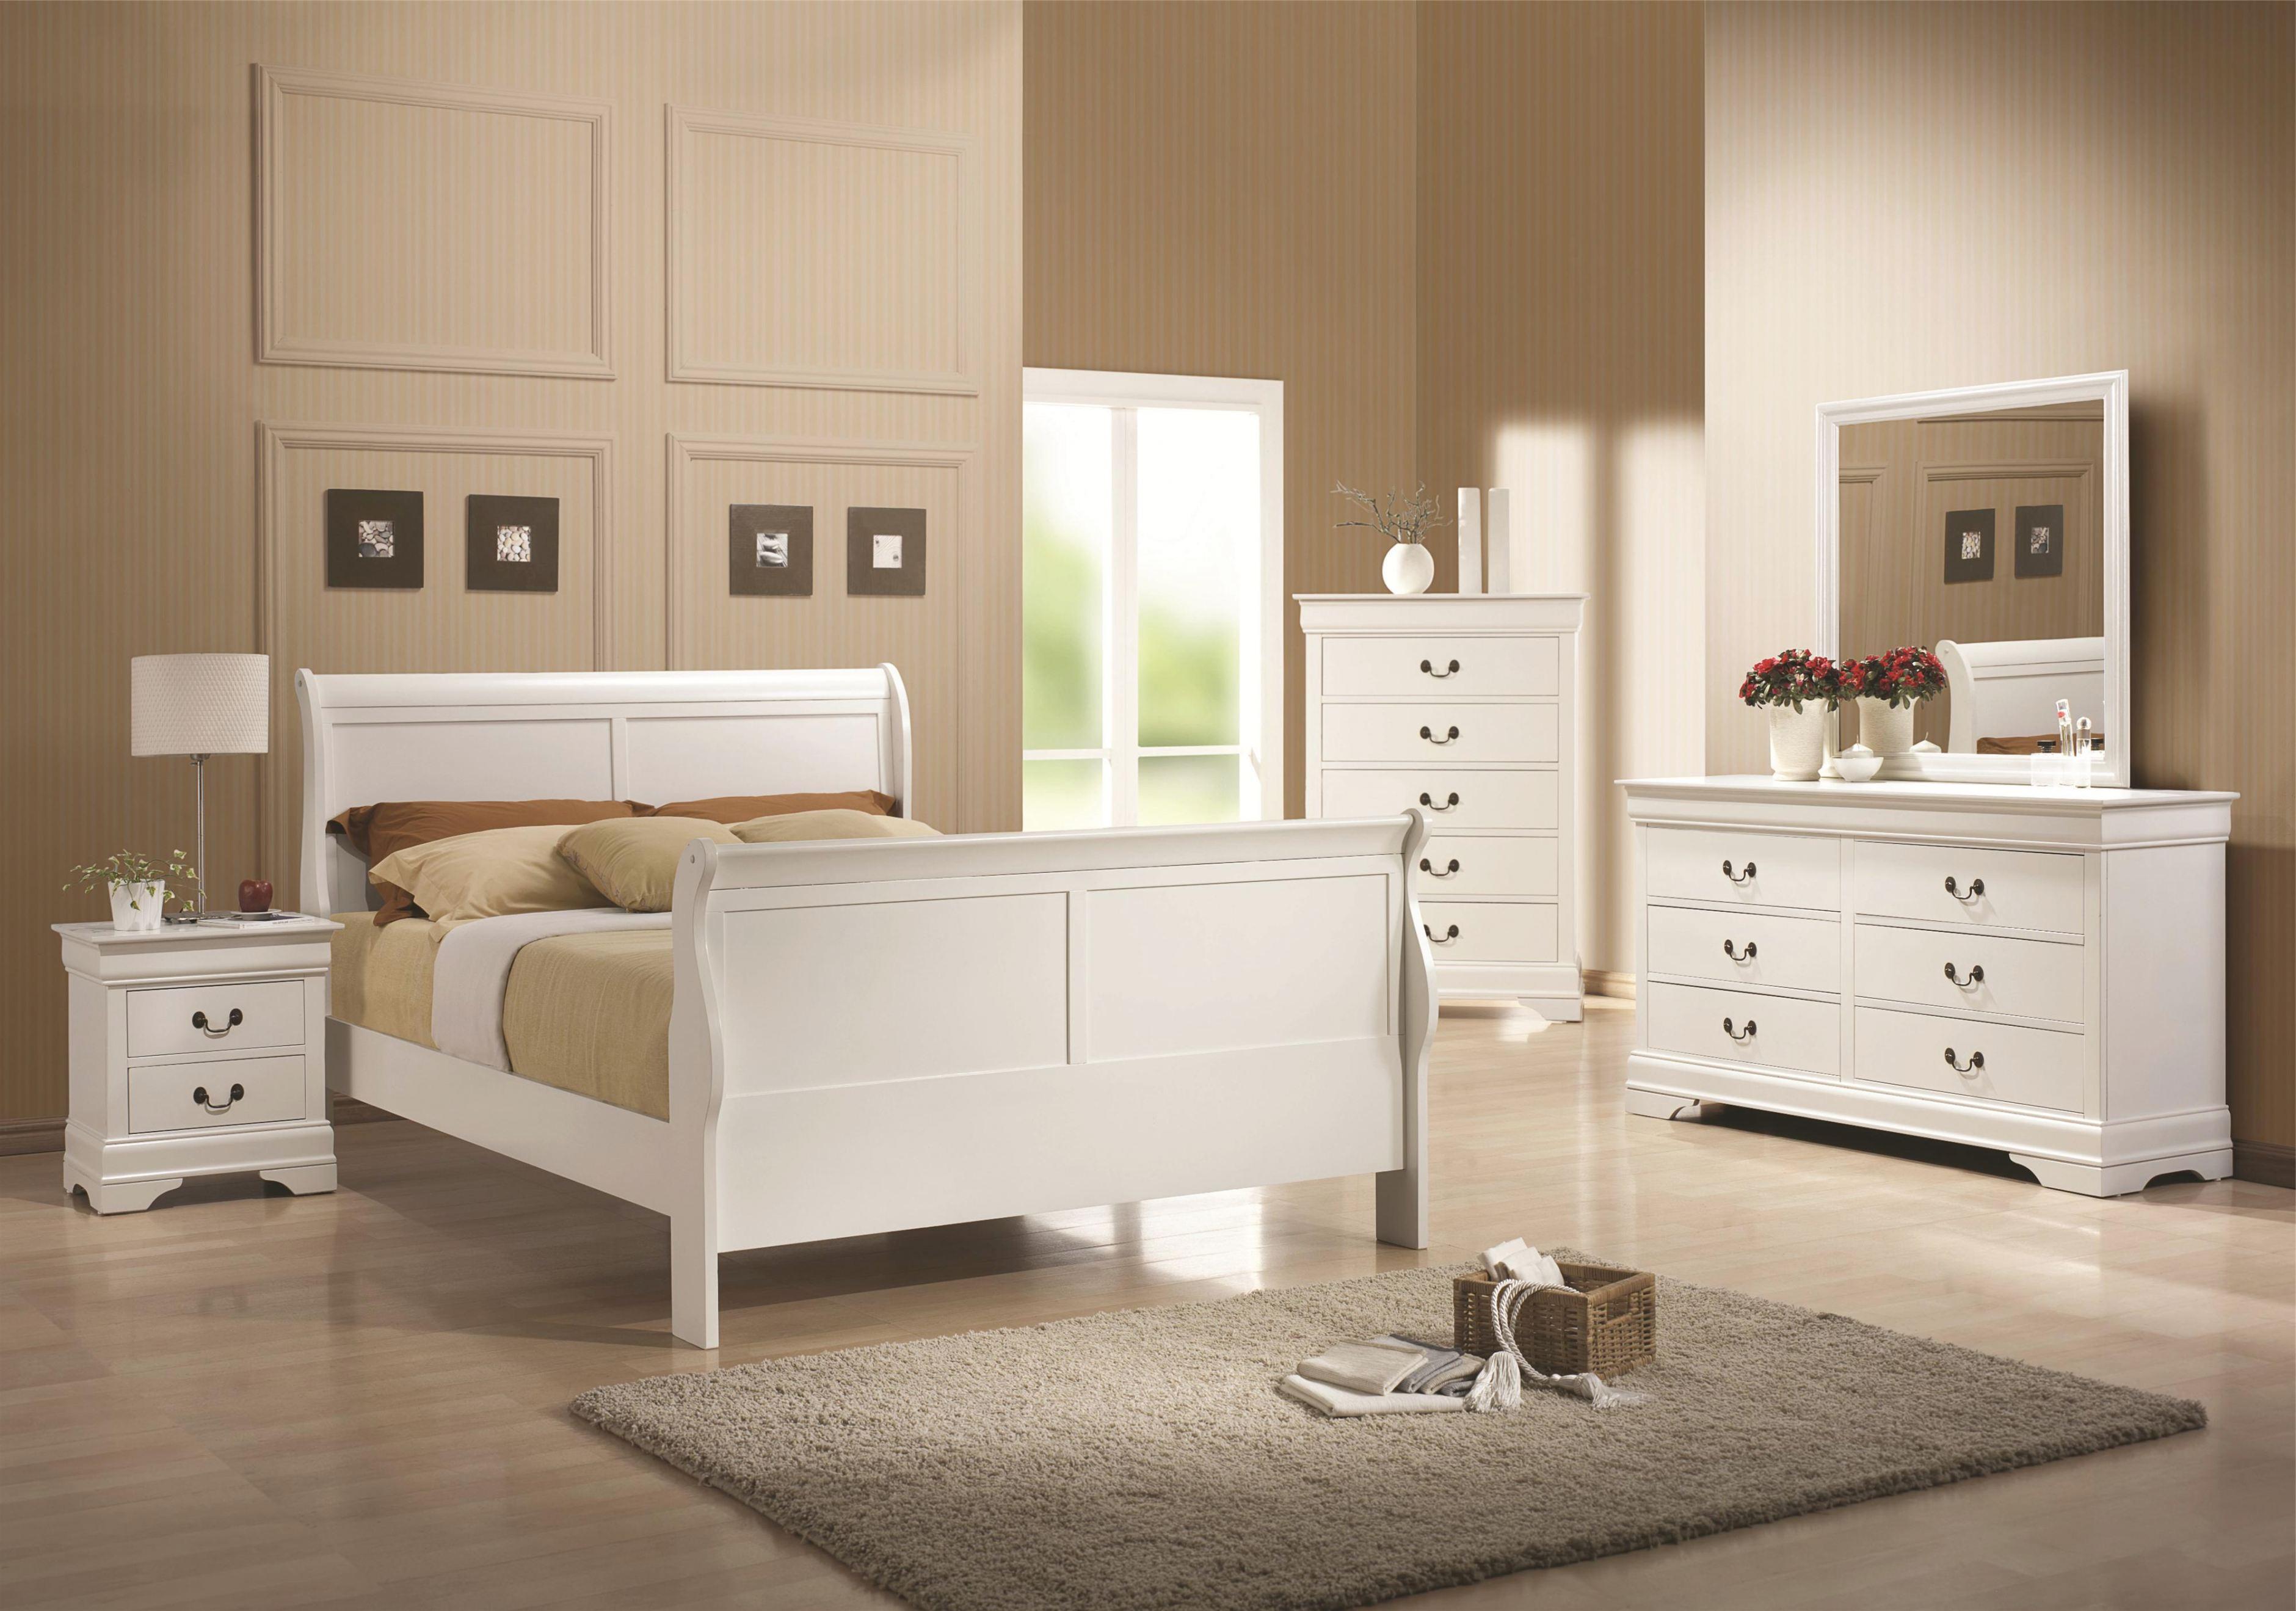 next bedroom furniture for kids photo - 6